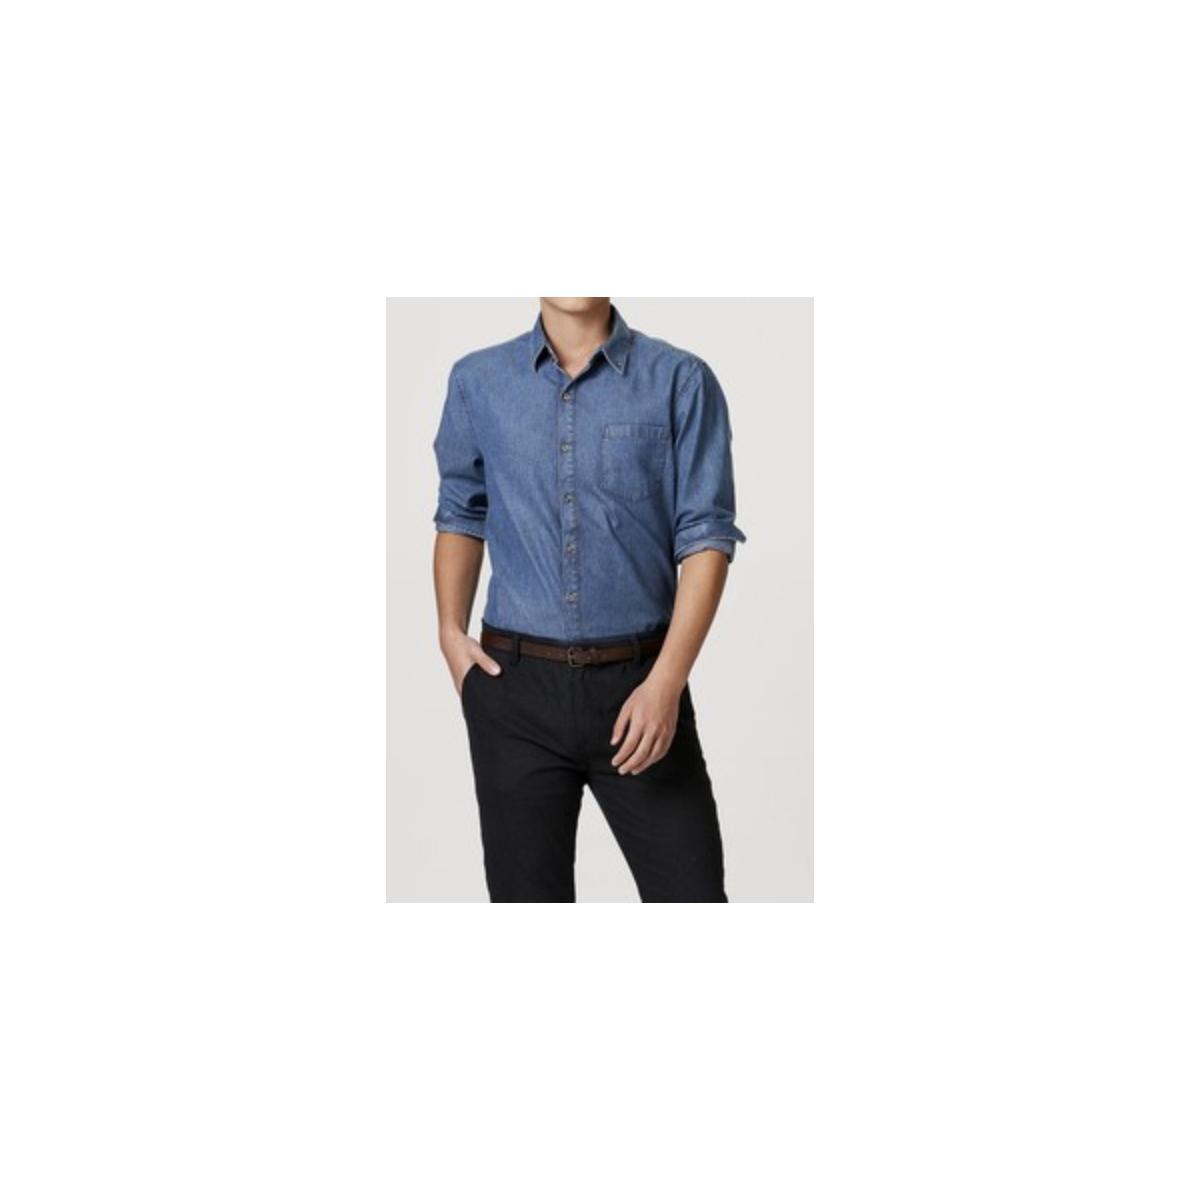 Camisa Masculina Hering H2ja 1bej Jeans